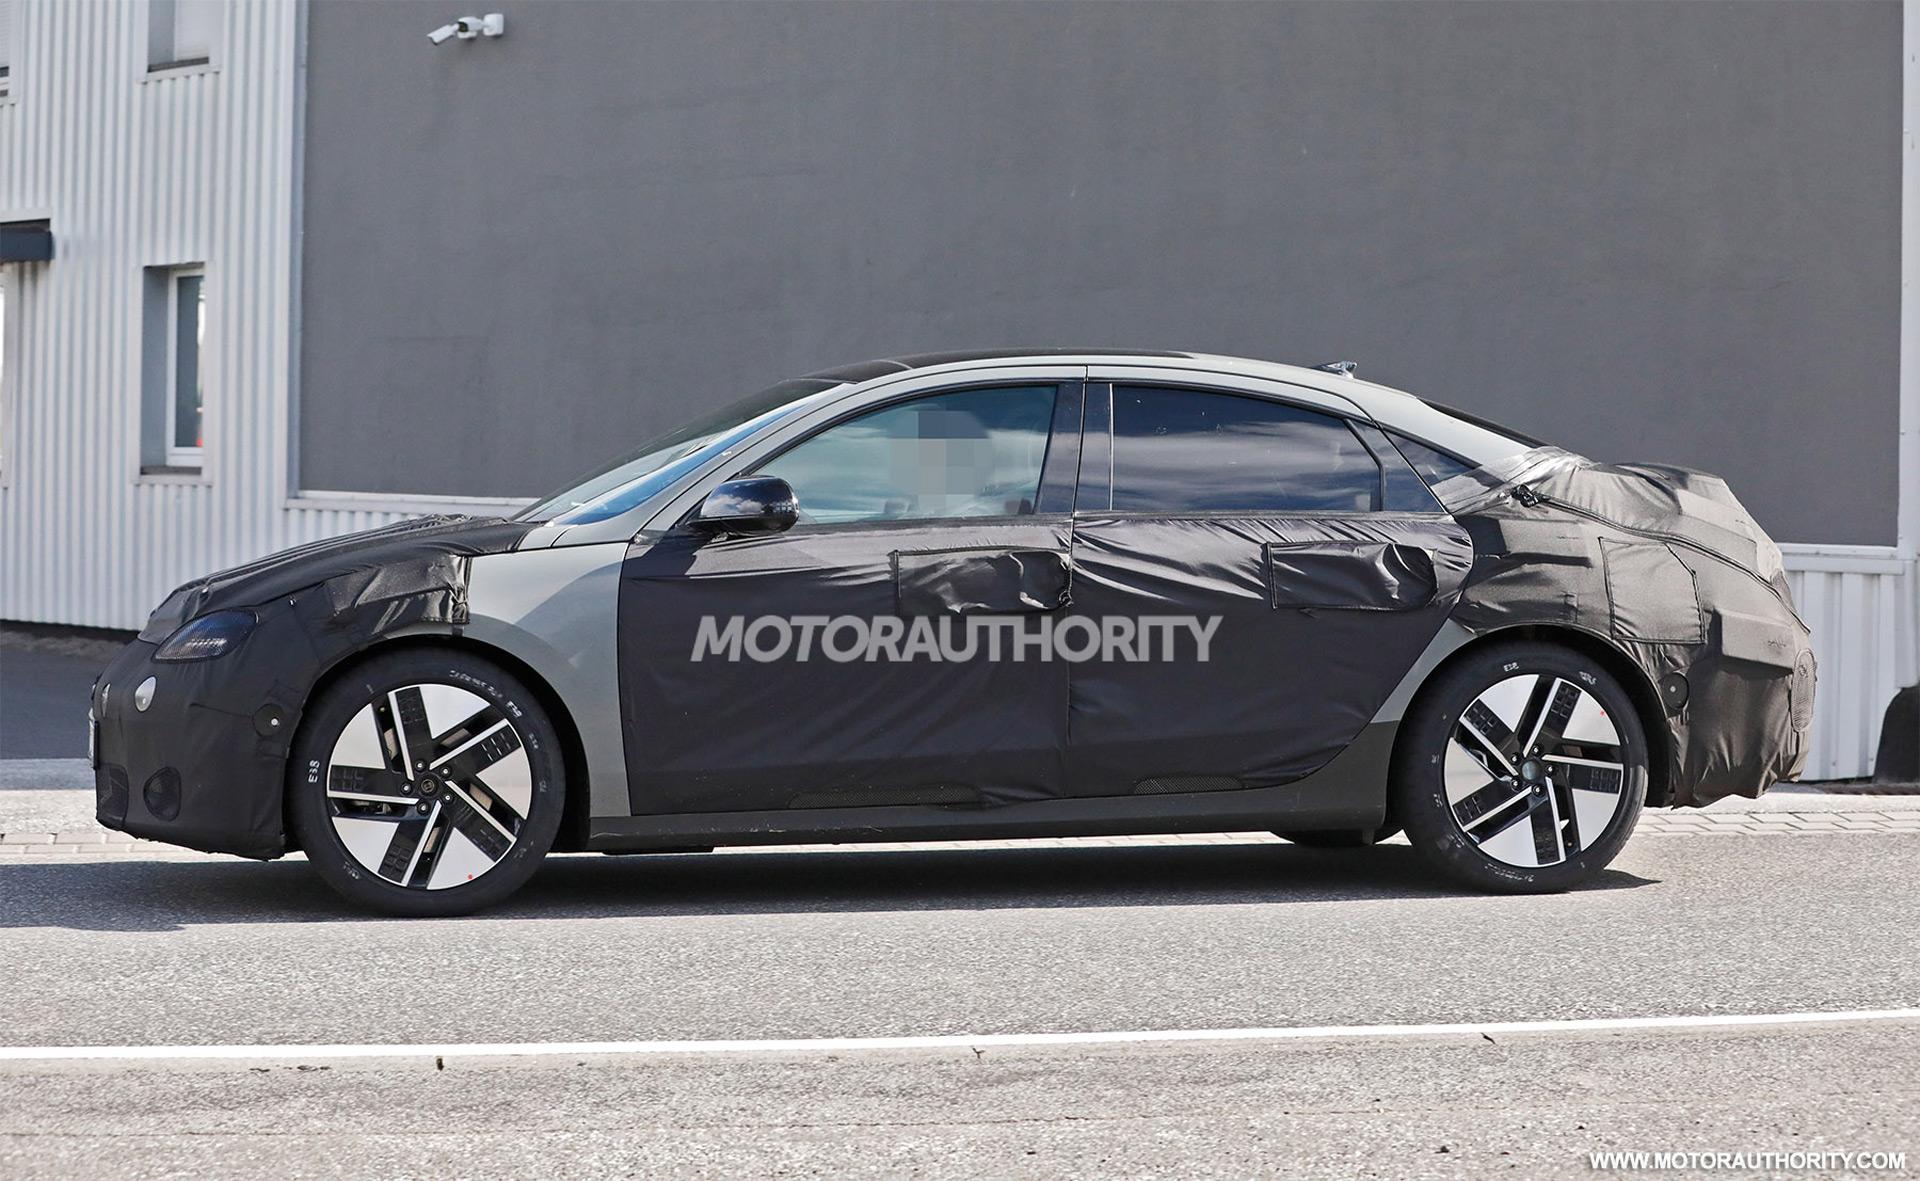 2023 Hyundai Ioniq 6, 2022 Ford F-150 Lightning, 2022 Lucid Air: Today's Car News